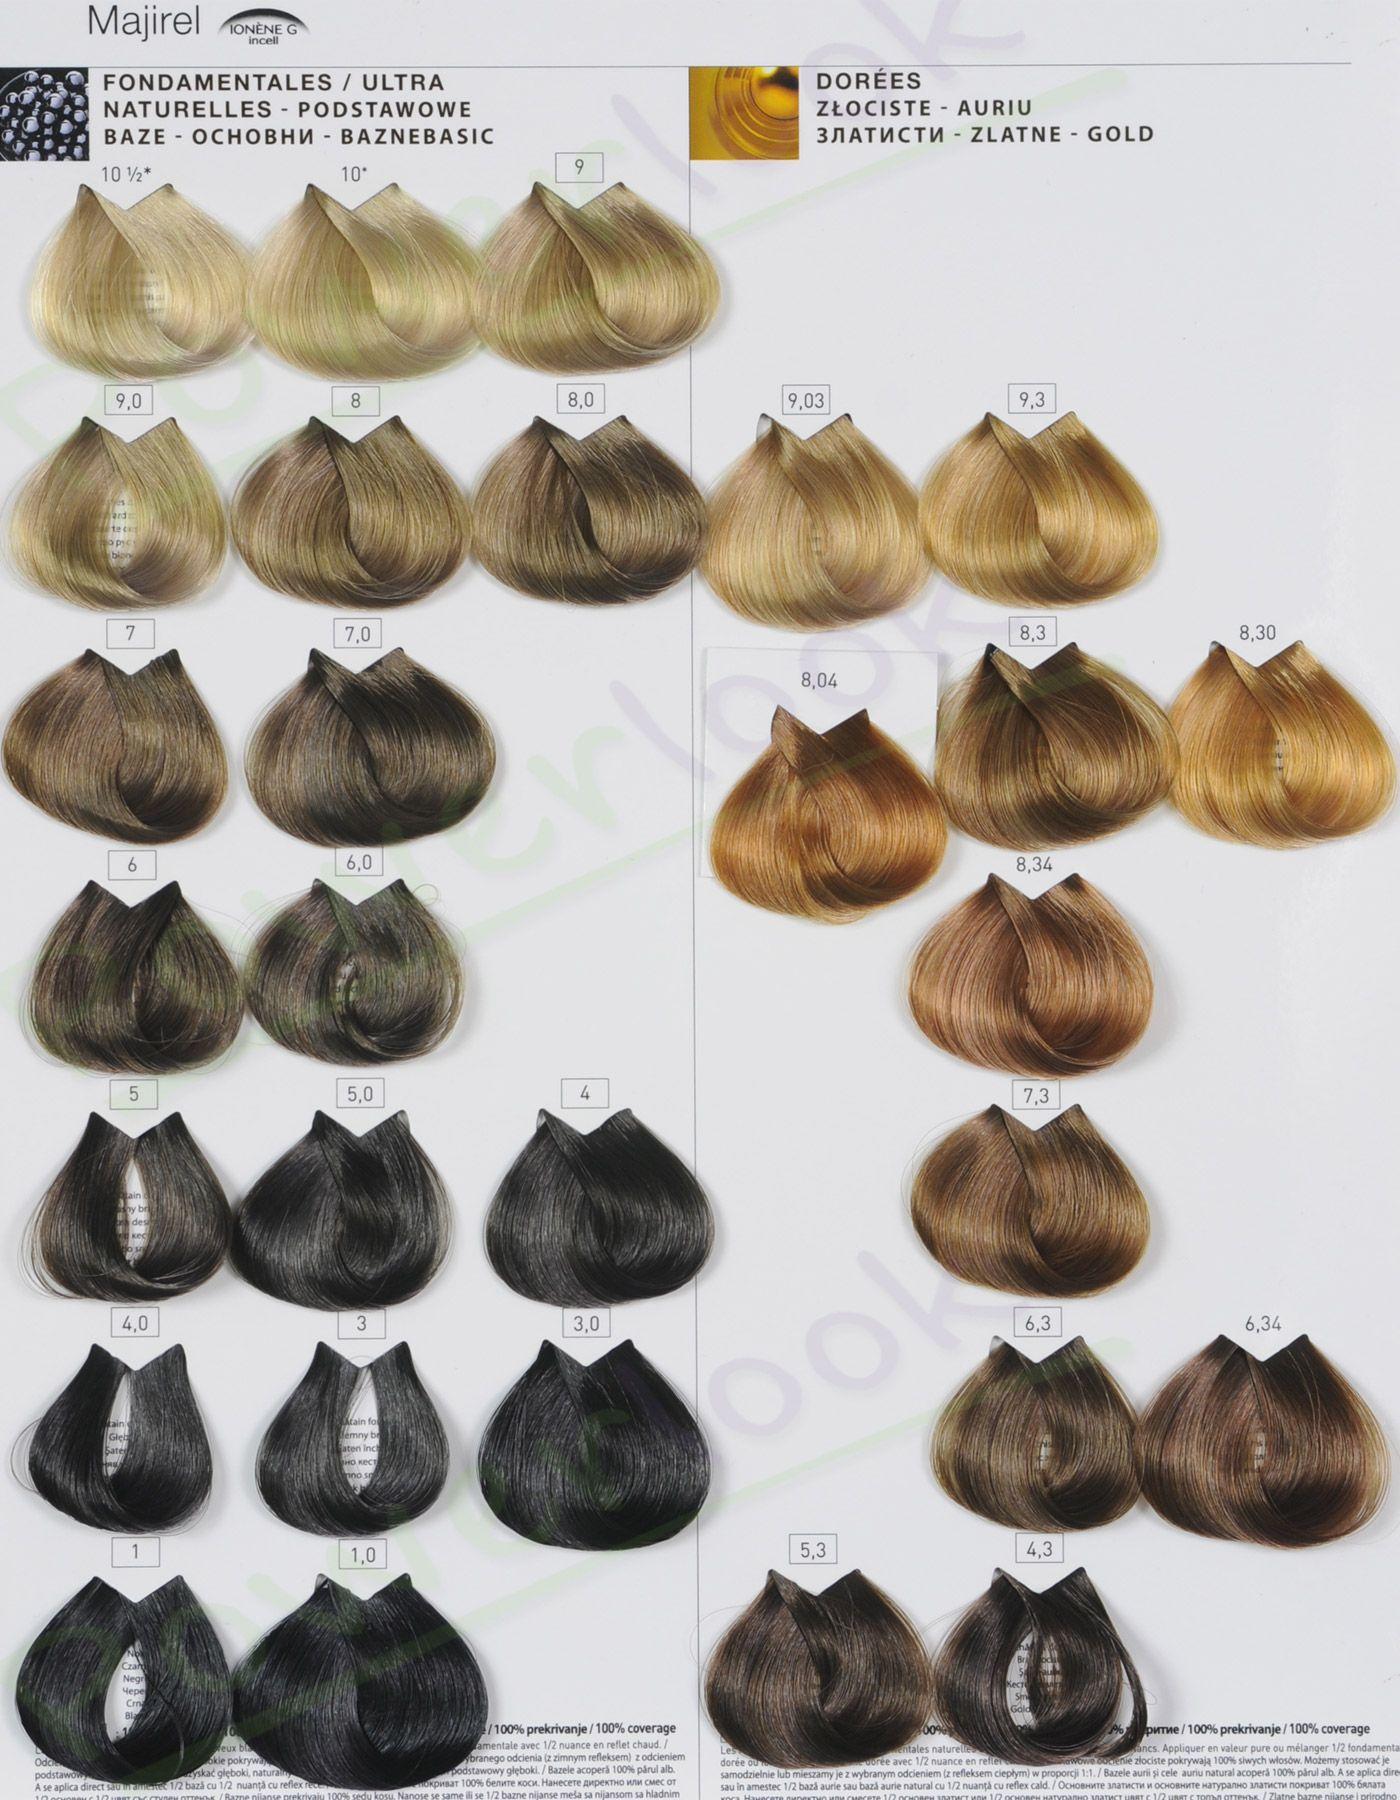 L Oreal Majirel Loreal Majirel In 2020 Loreal Hair Color Loreal Hair Color Chart Hair Color Chart